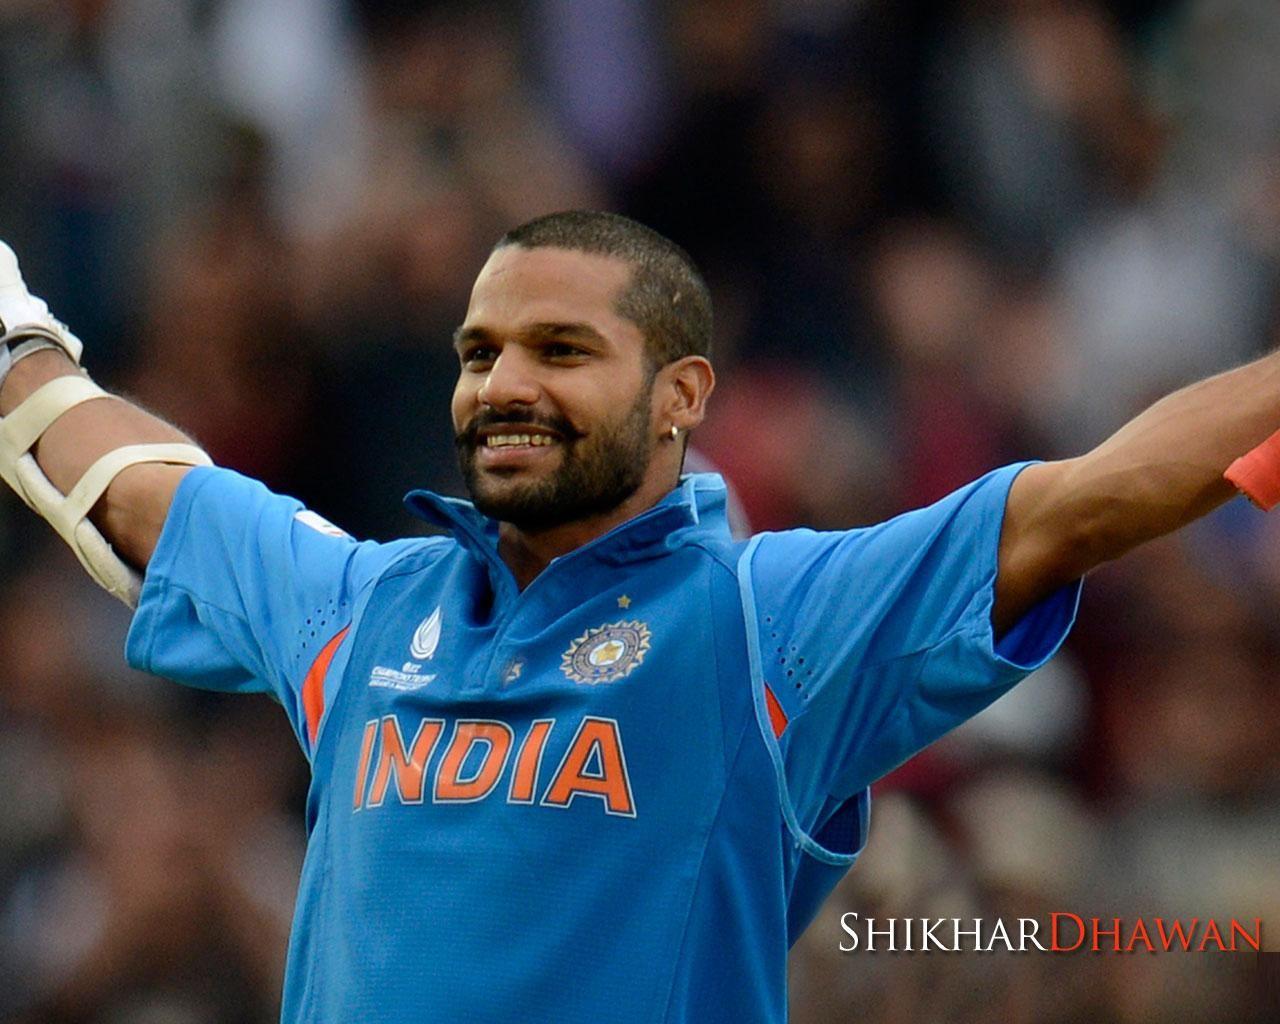 Shikhar Dhawan Indian Cricketer Hd Wallpaper Indian Cricketer